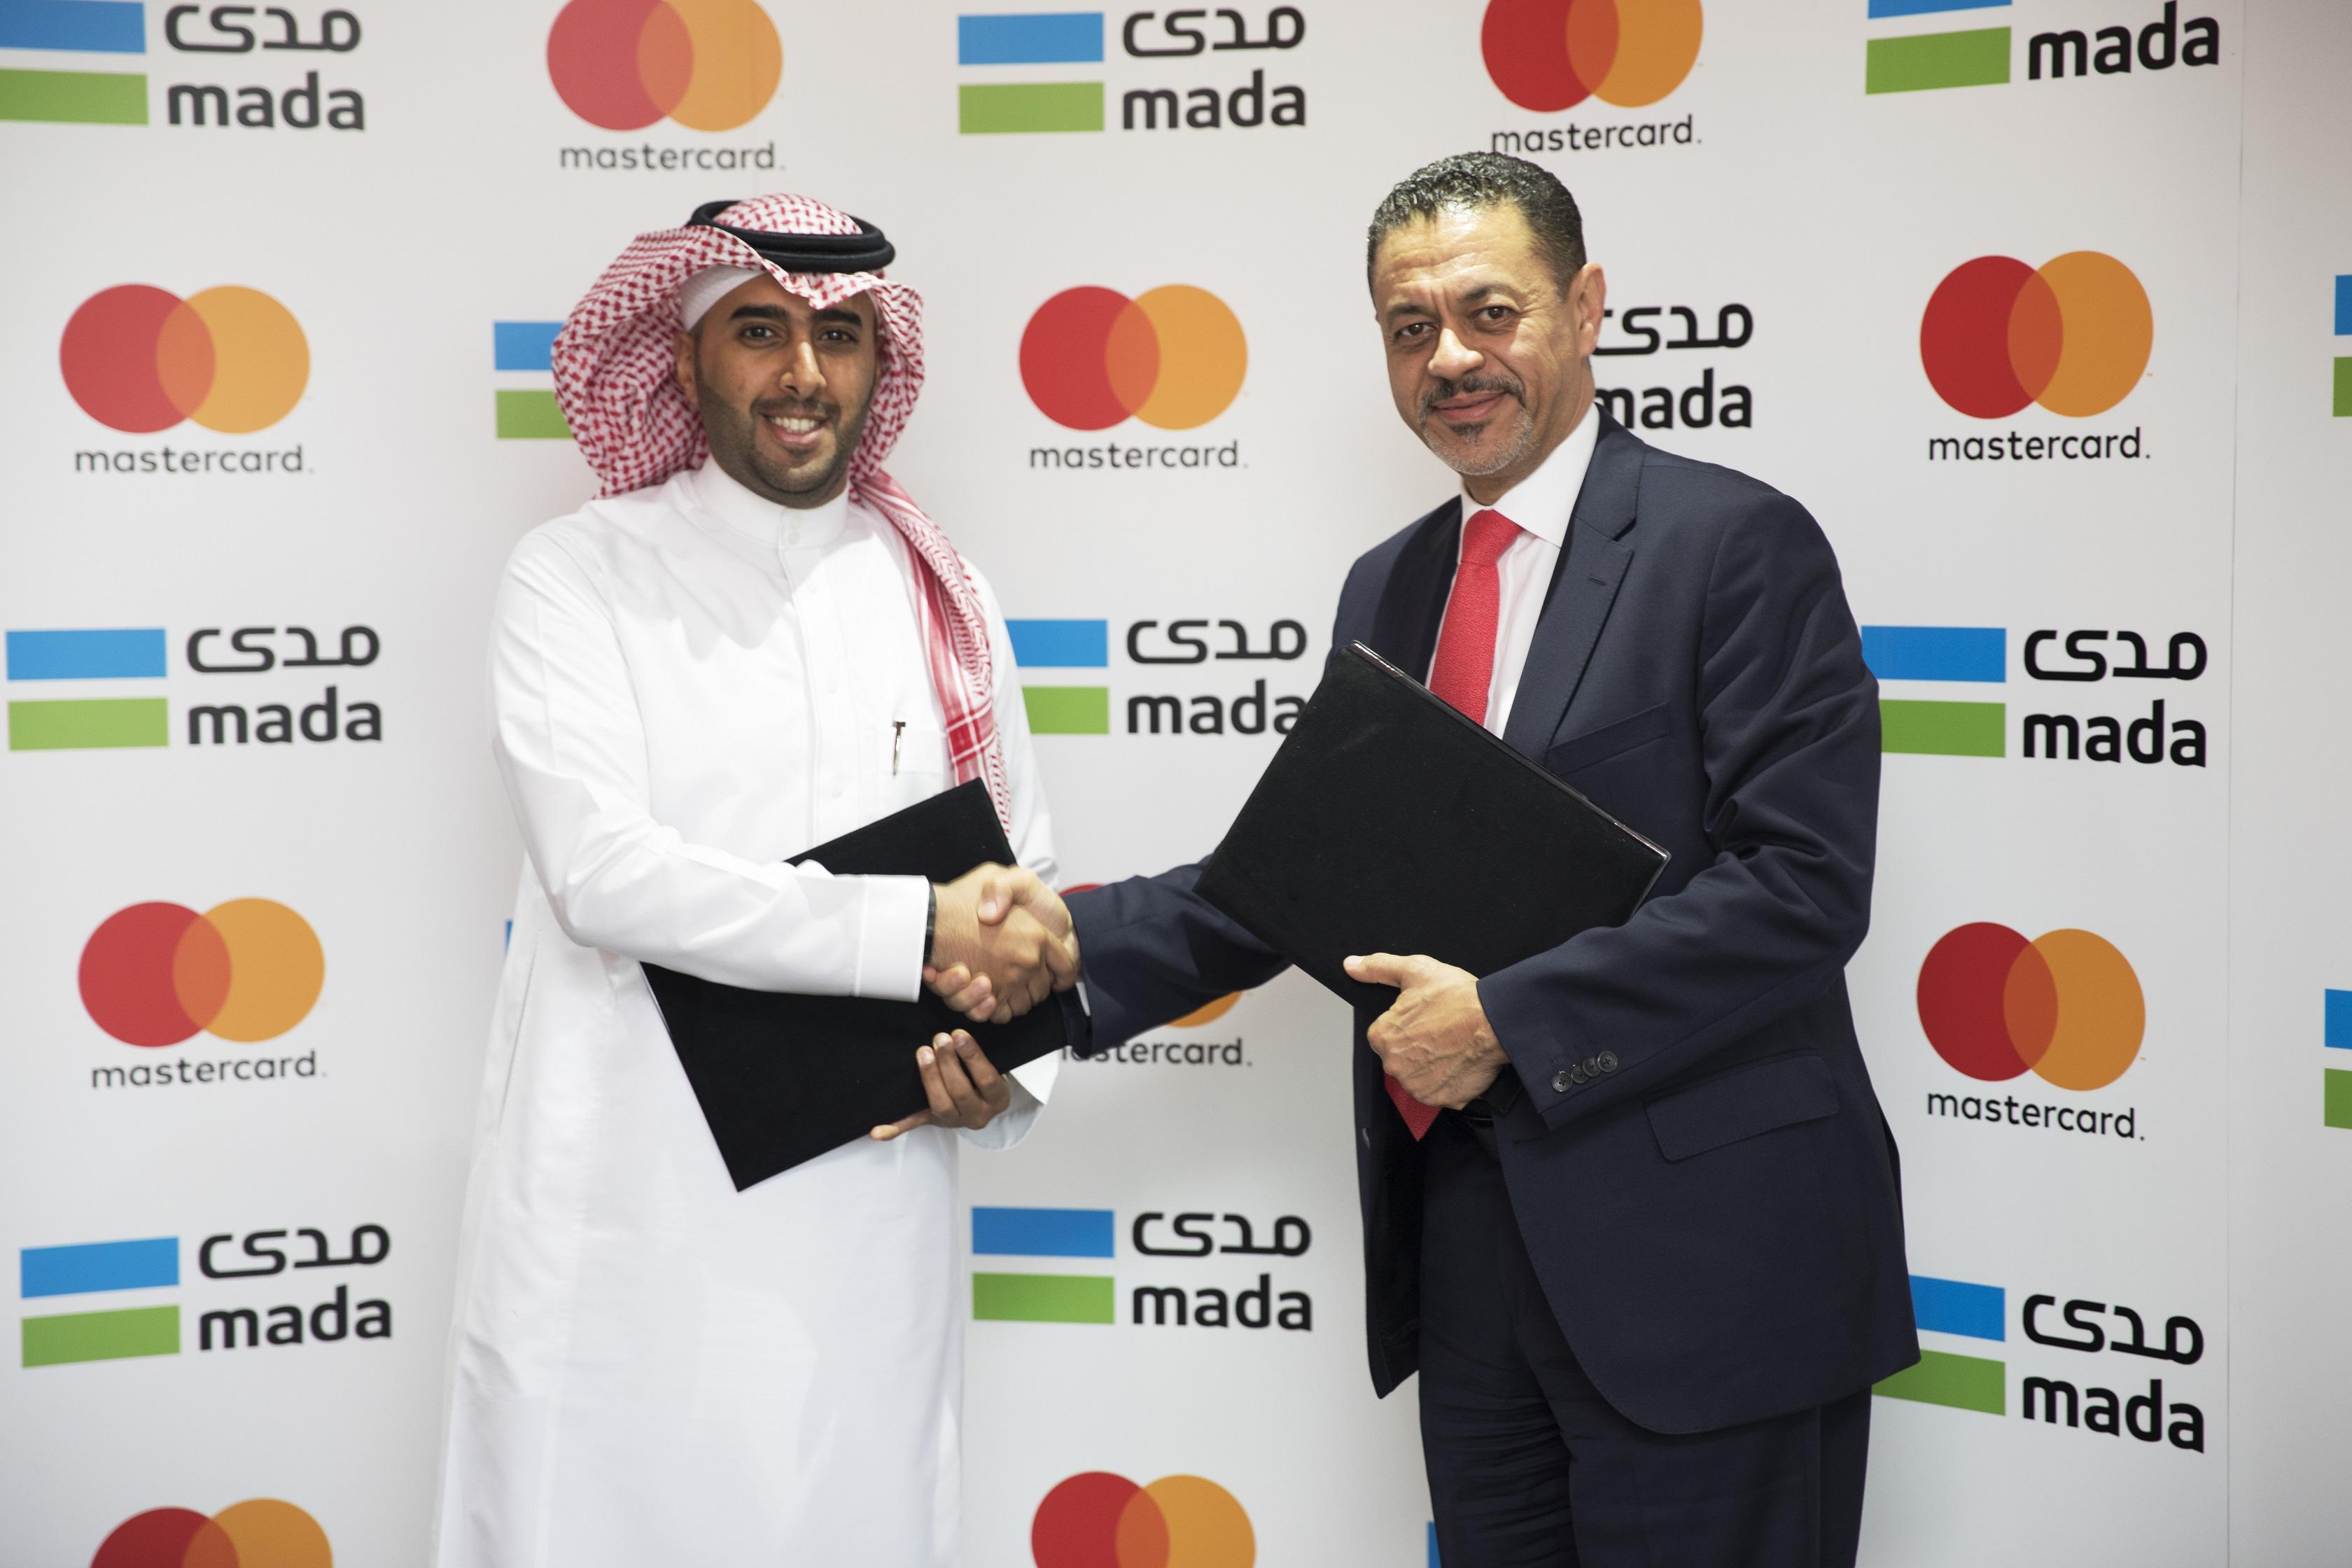 Mastercard & mada_Release